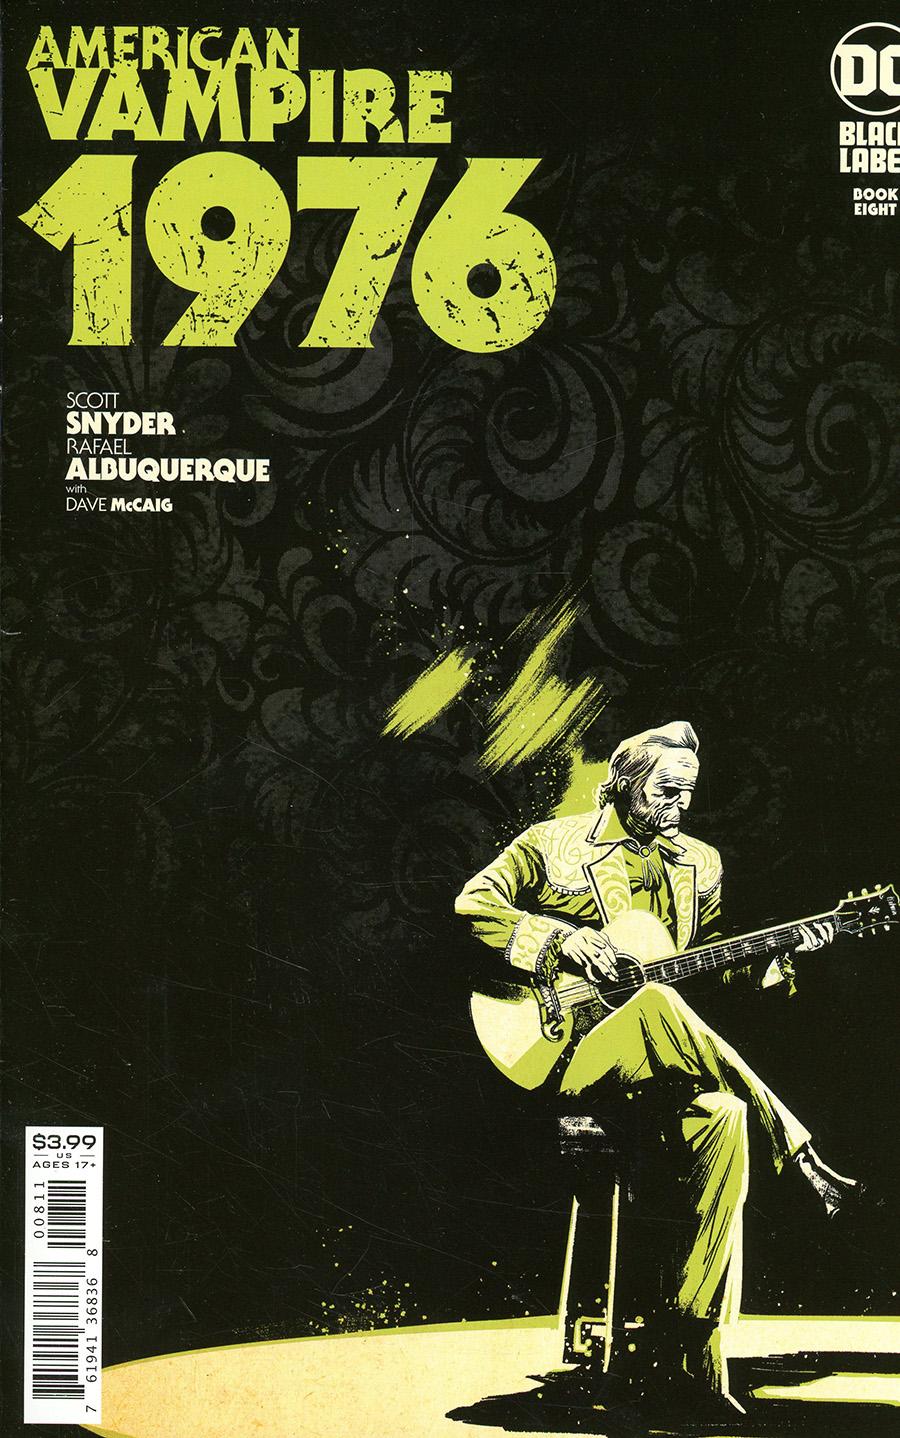 American Vampire 1976 #8 Cover A Regular Rafael Albuquerque Cover